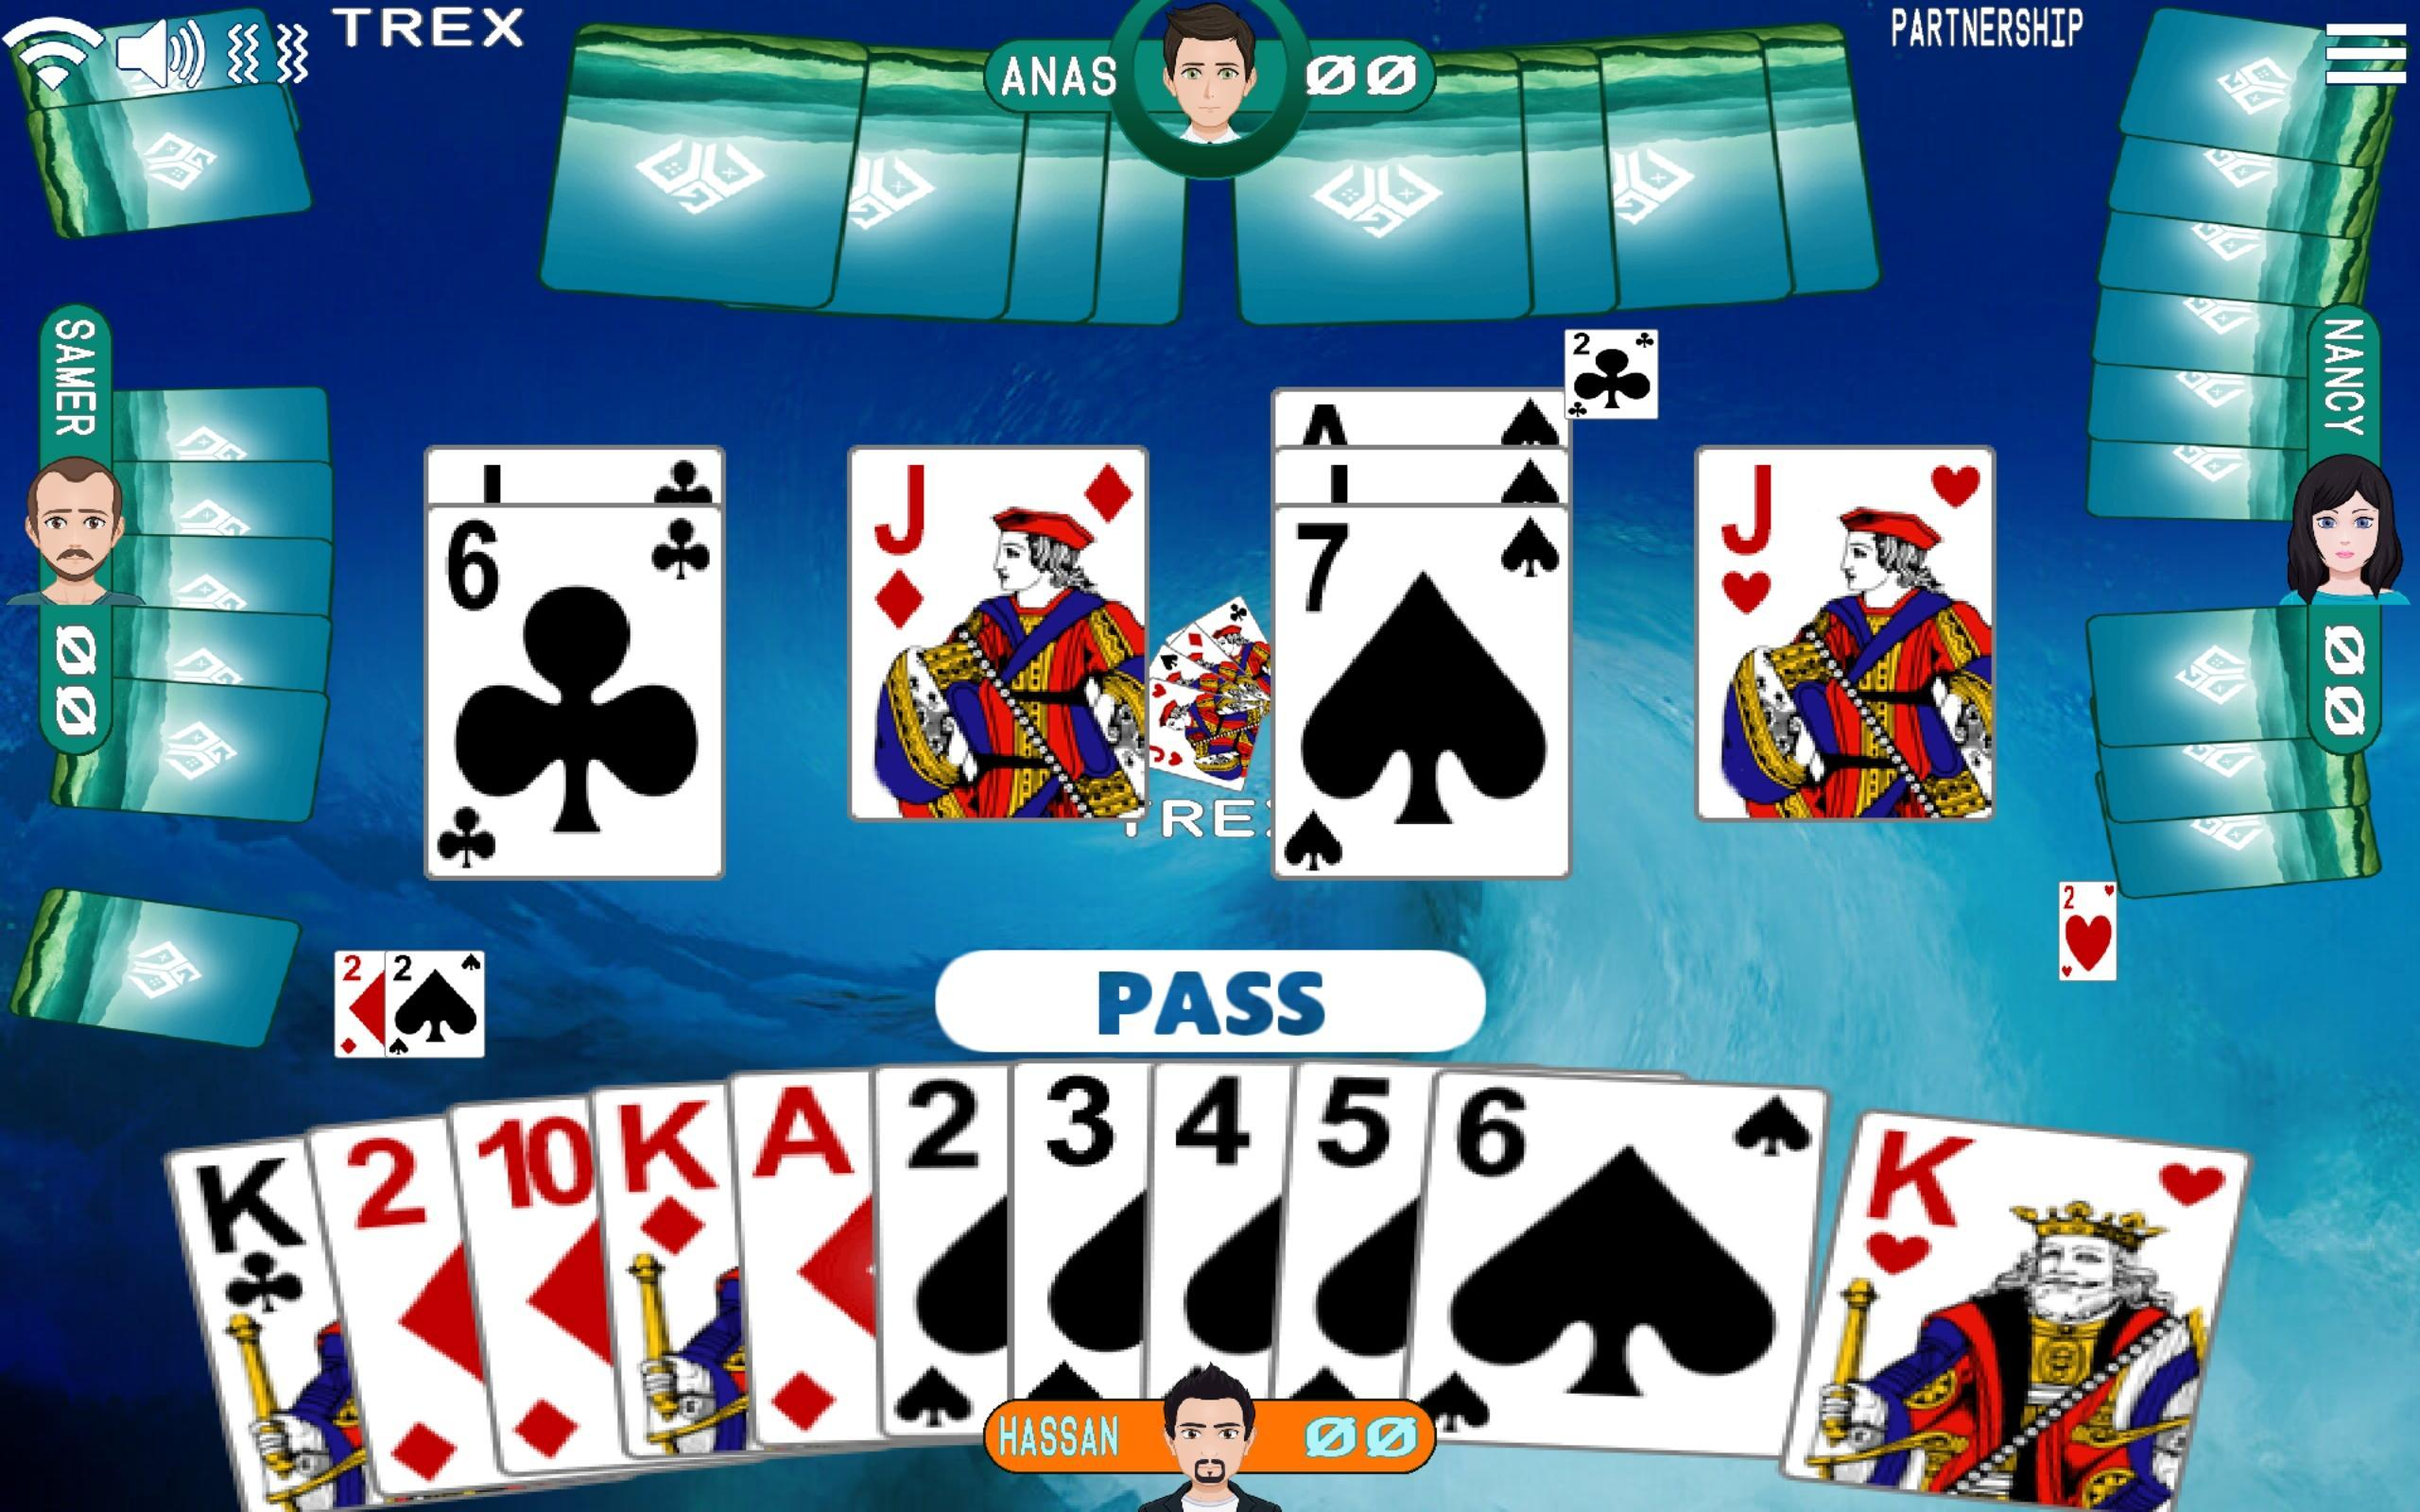 Golden Card Games (Tarneeb - Trix - Solitaire) 20.1.1.30 Screenshot 2